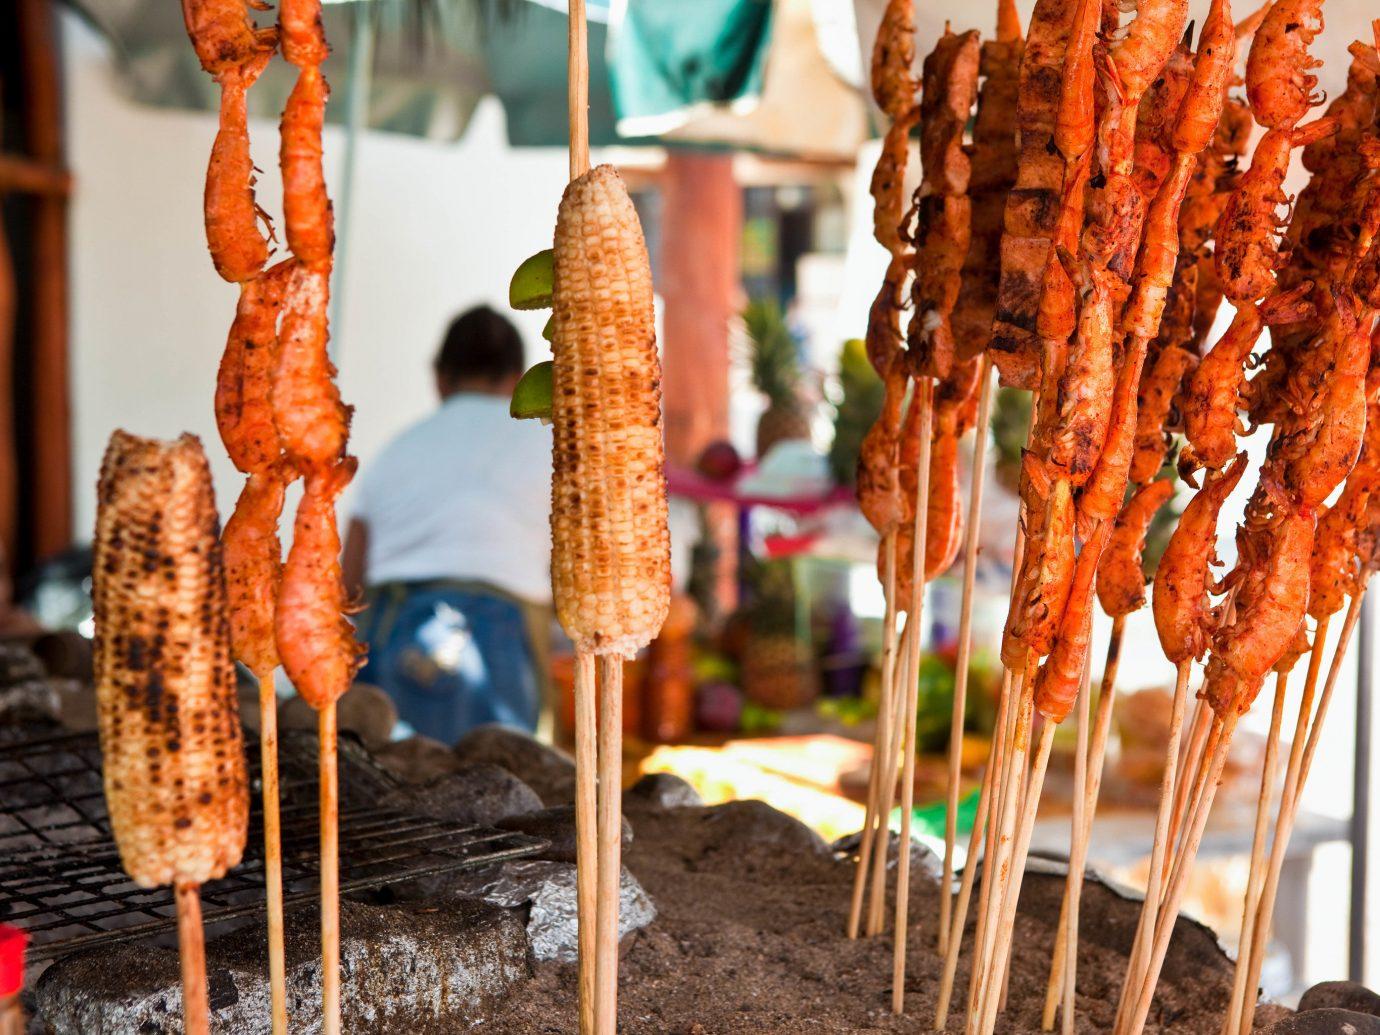 Food + Drink Mexico Puerto Vallarta food grilled food meat skewer street food animal source foods cuisine churrasco food dish grilling finger food